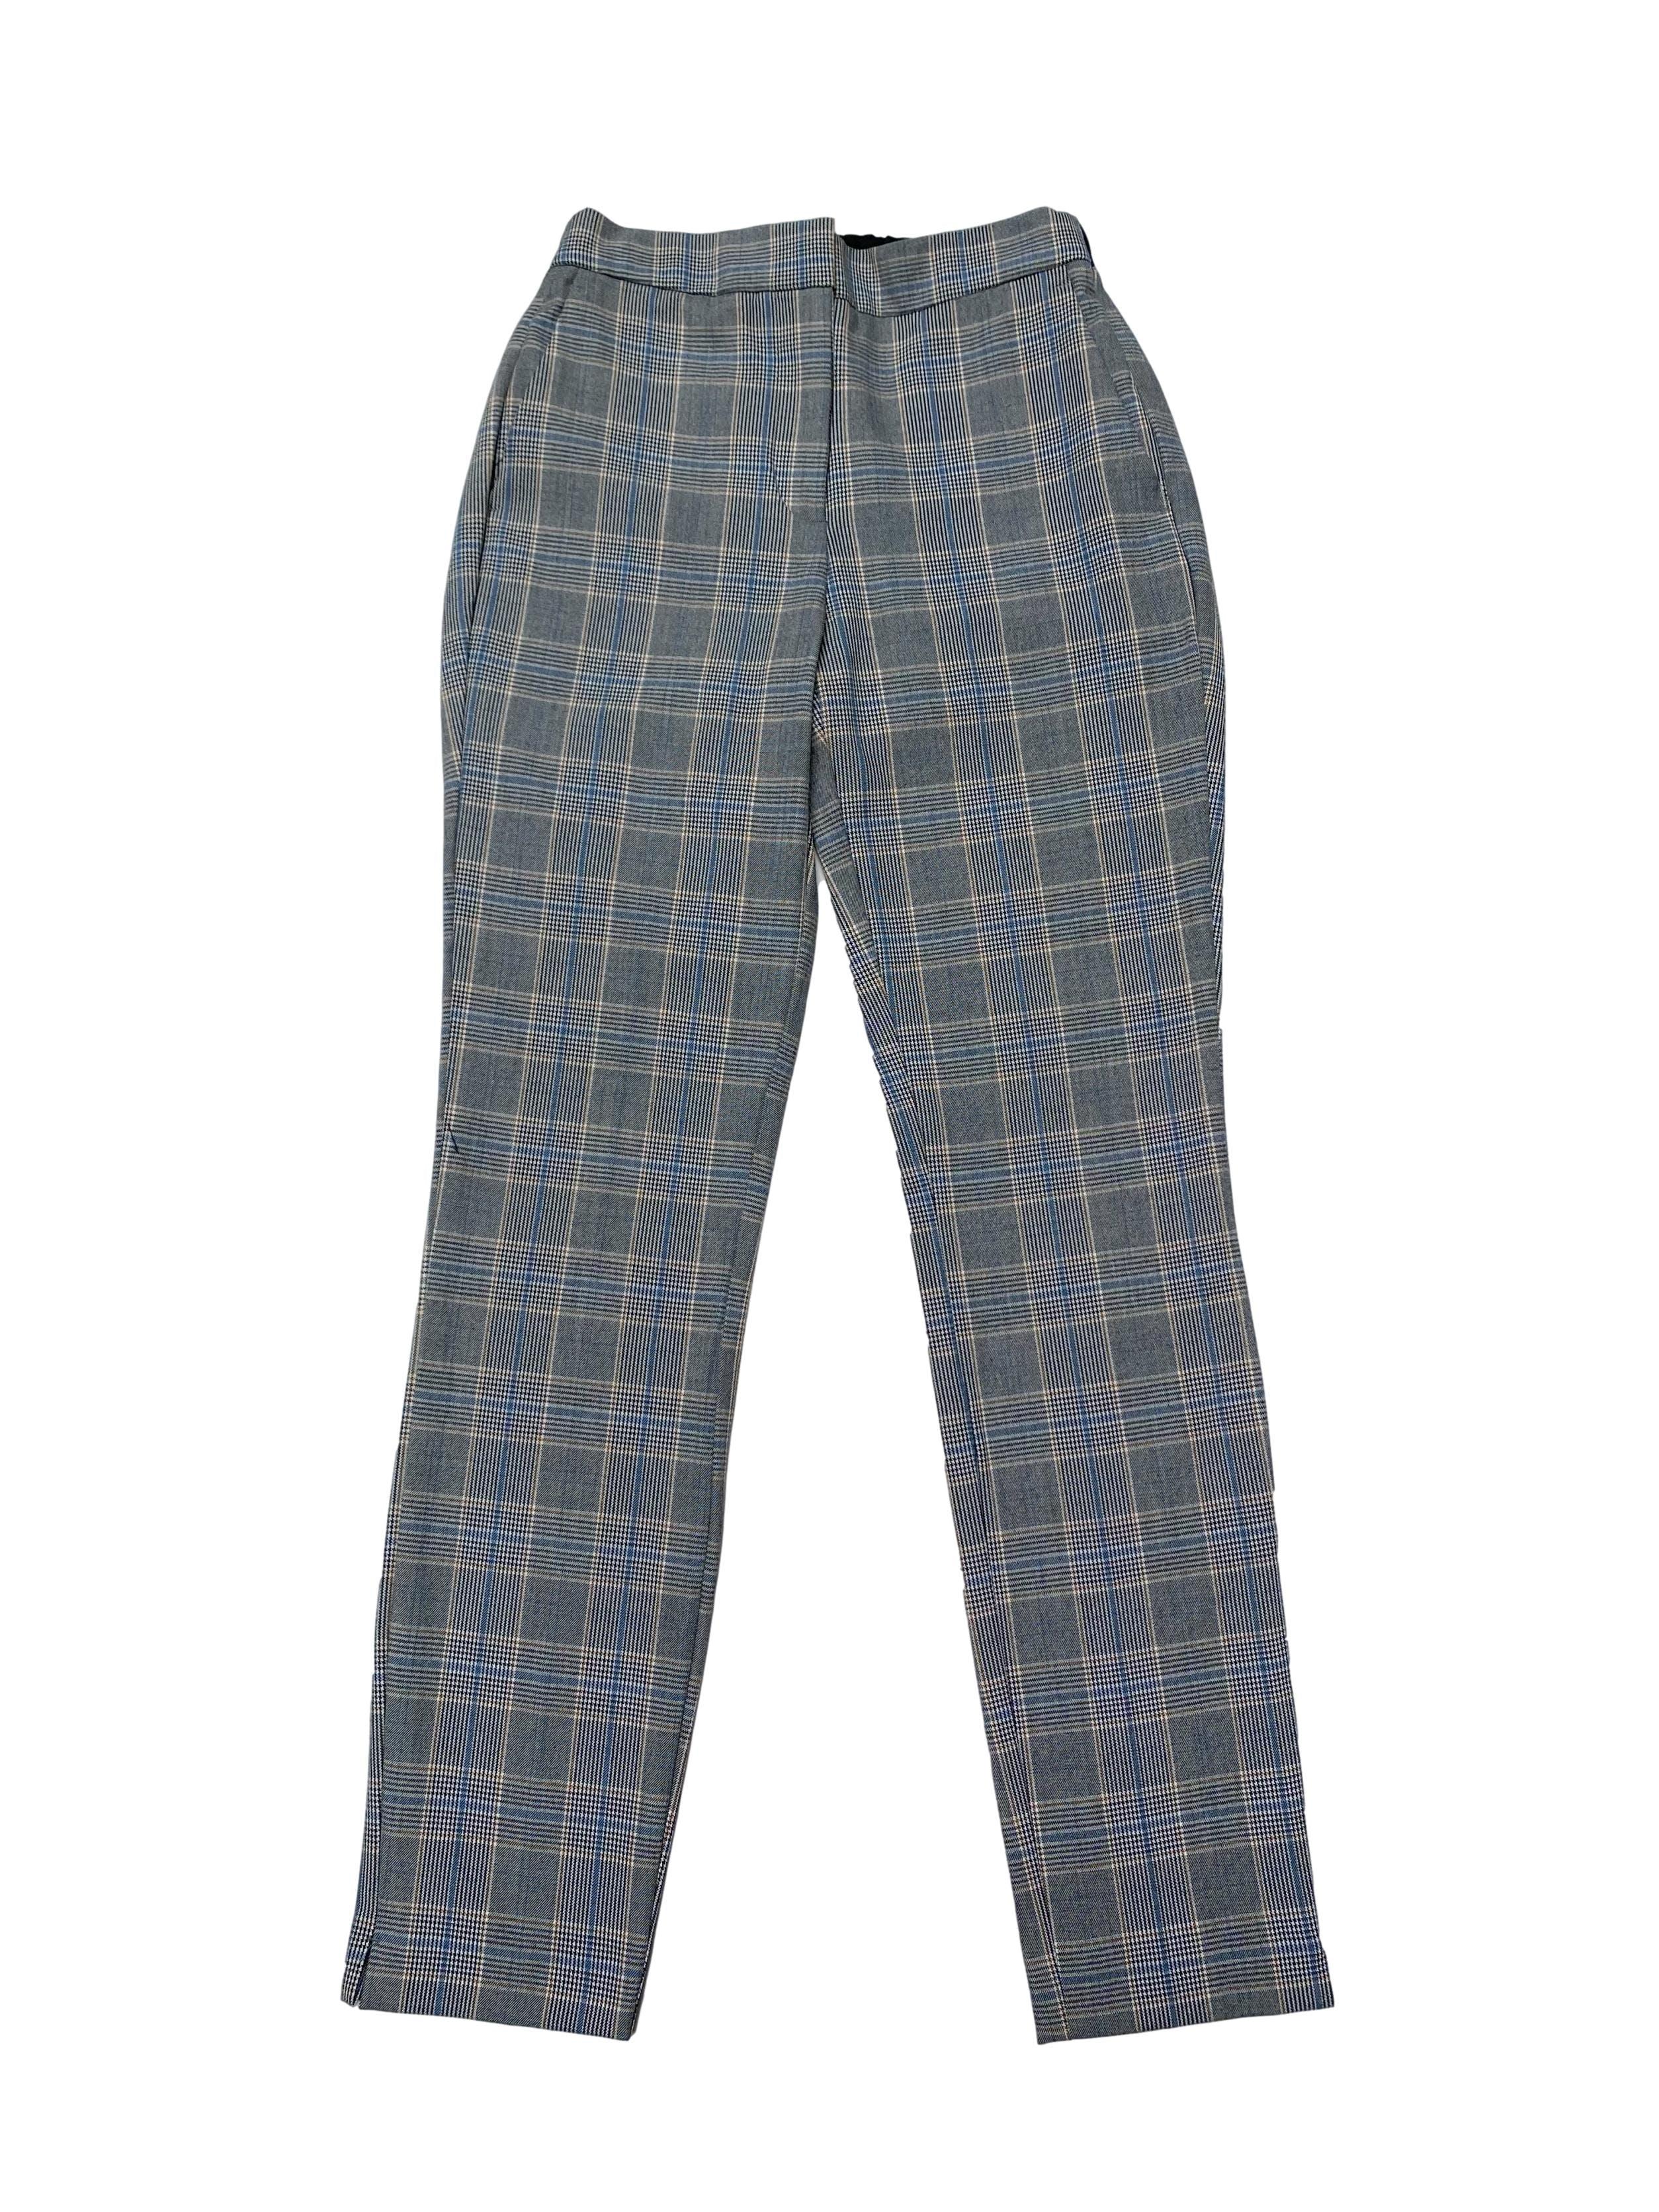 Pantalón Zara príncipe de gales con bolsillos laterales. Cintura 66cm Largo 94cm